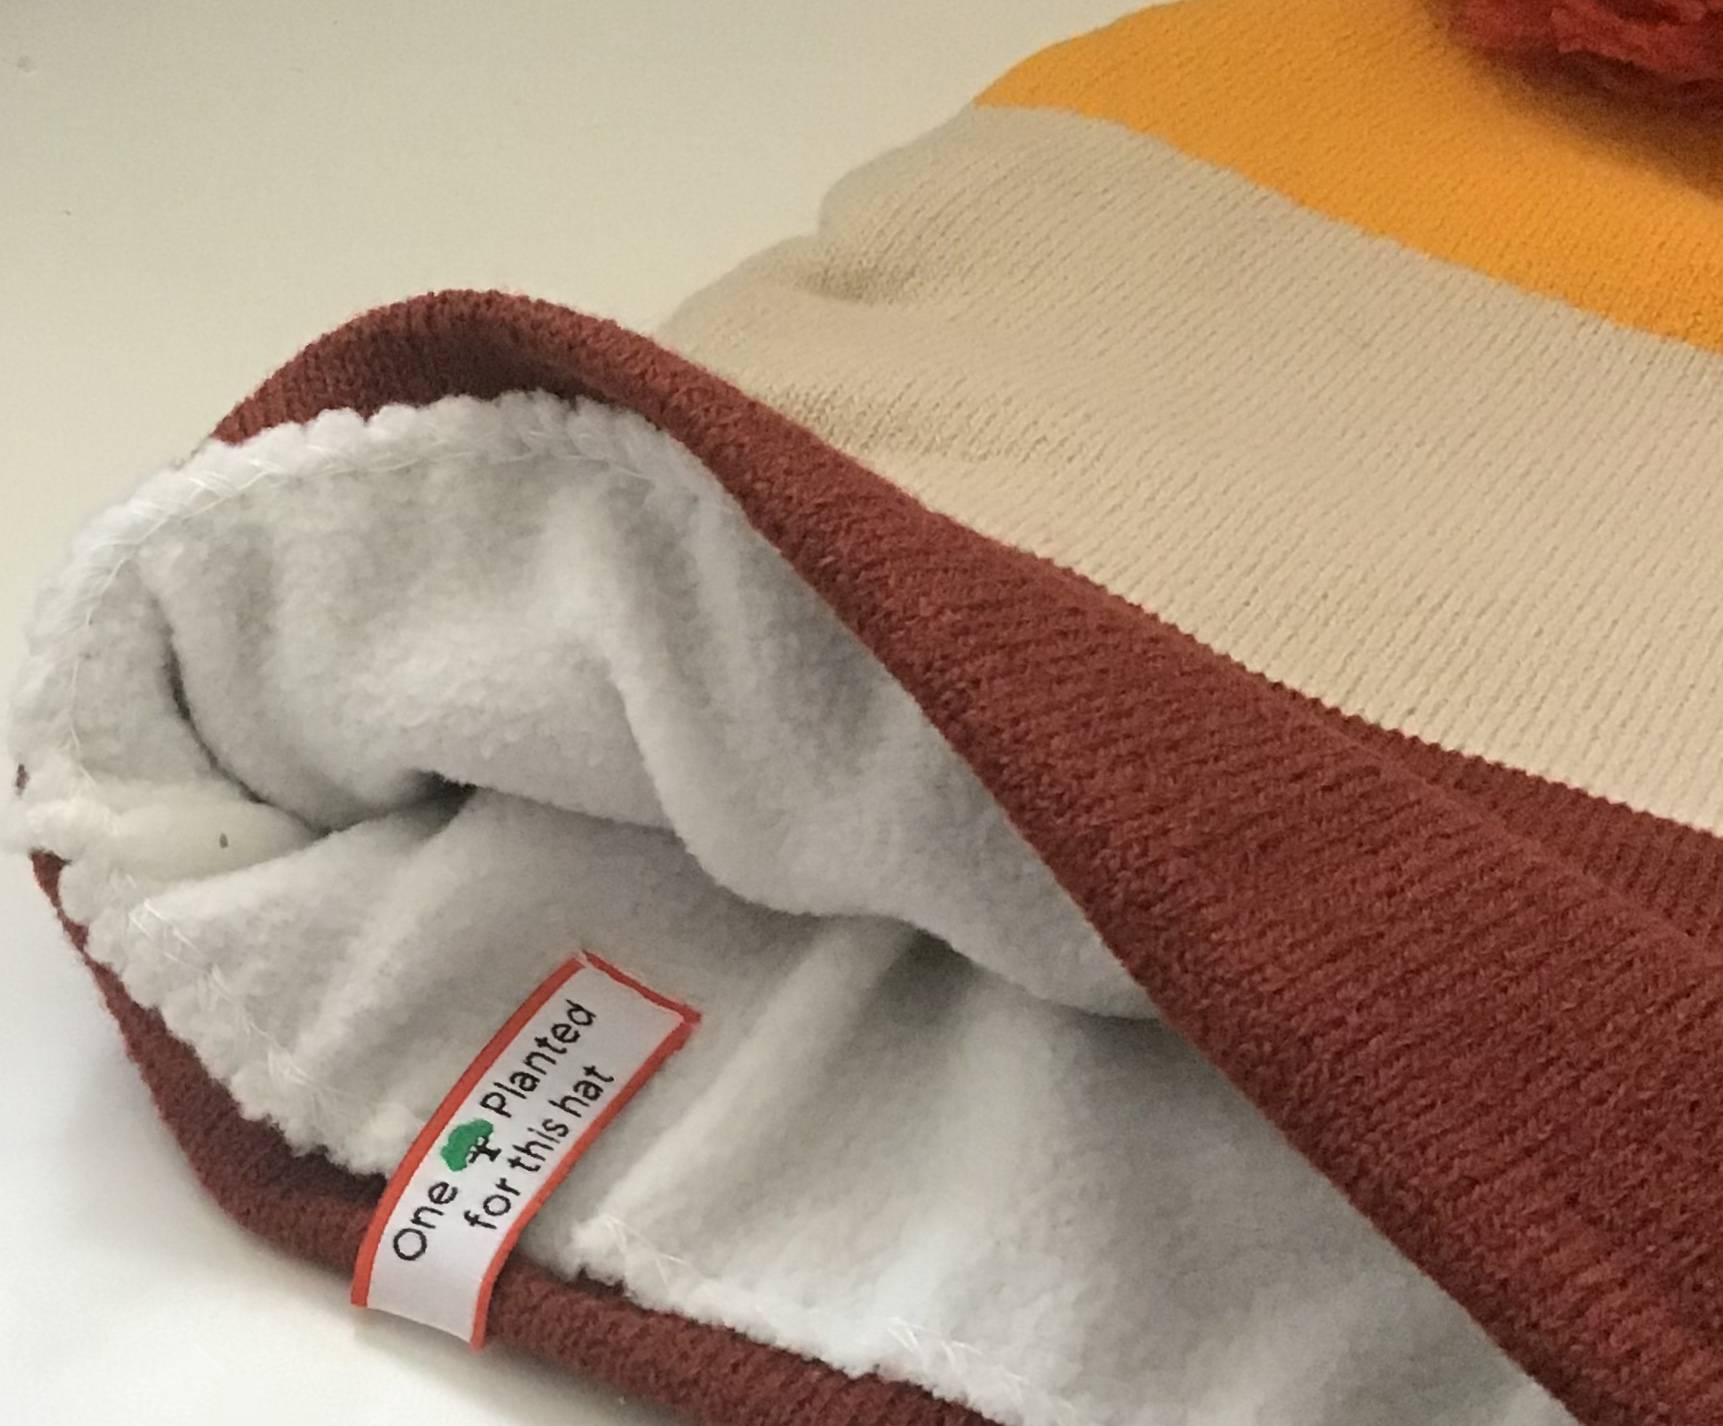 Fleece lined beanie with custom label